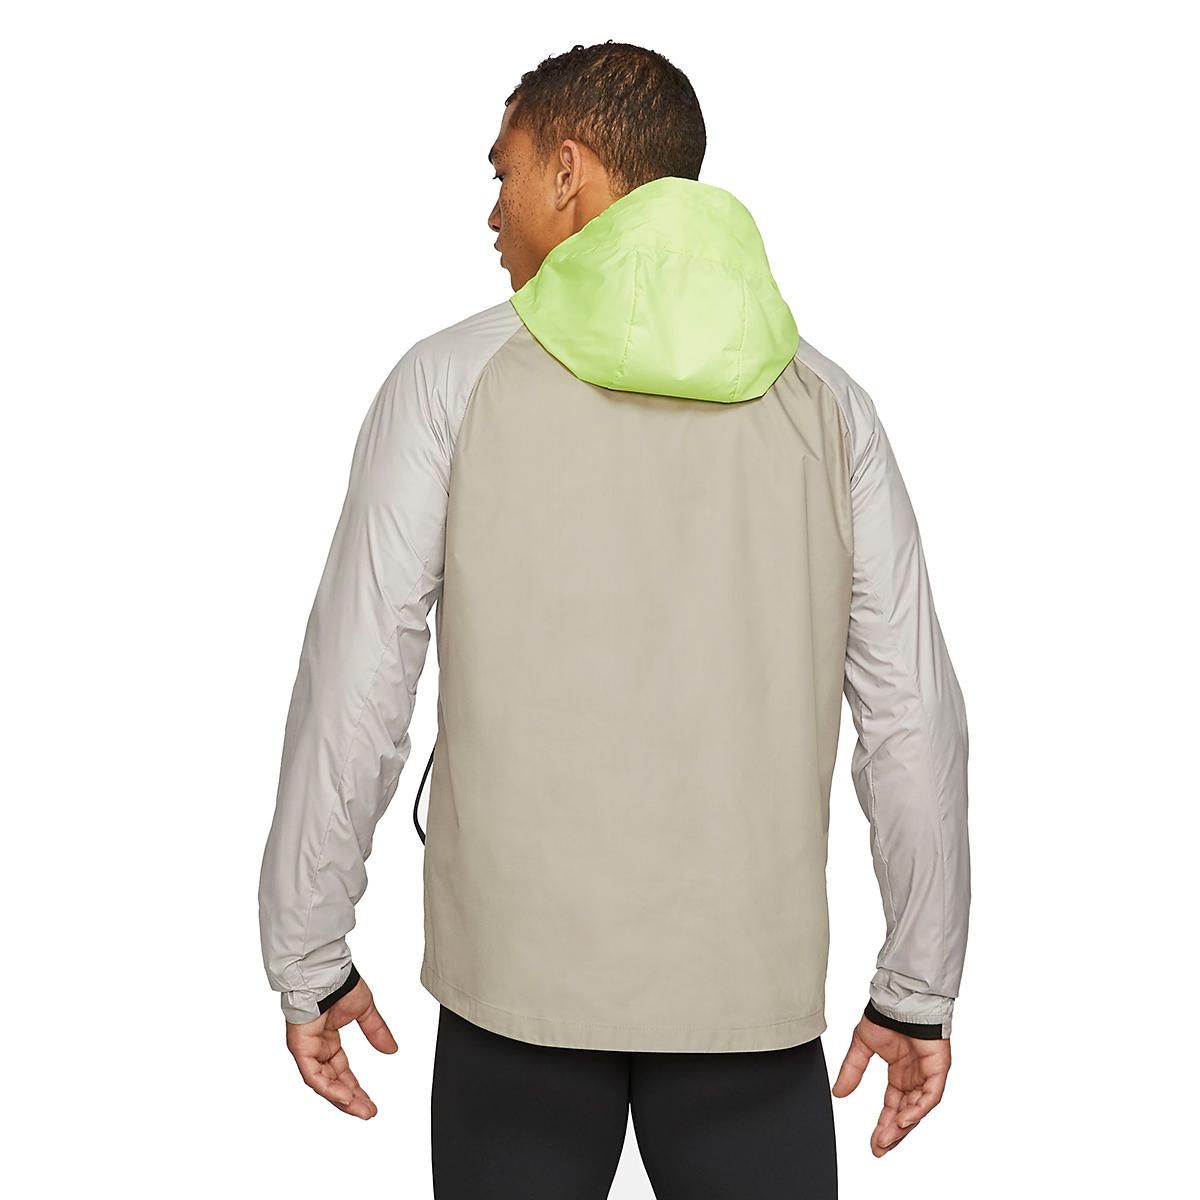 Men's Nike Windrunner Trail Running Jacket - Color: Light Lemon Twist/Moon Fossil/Bright Spruce - Size: S, Light Lemon Twist/Moon Fossil/Bright Spruce, large, image 2